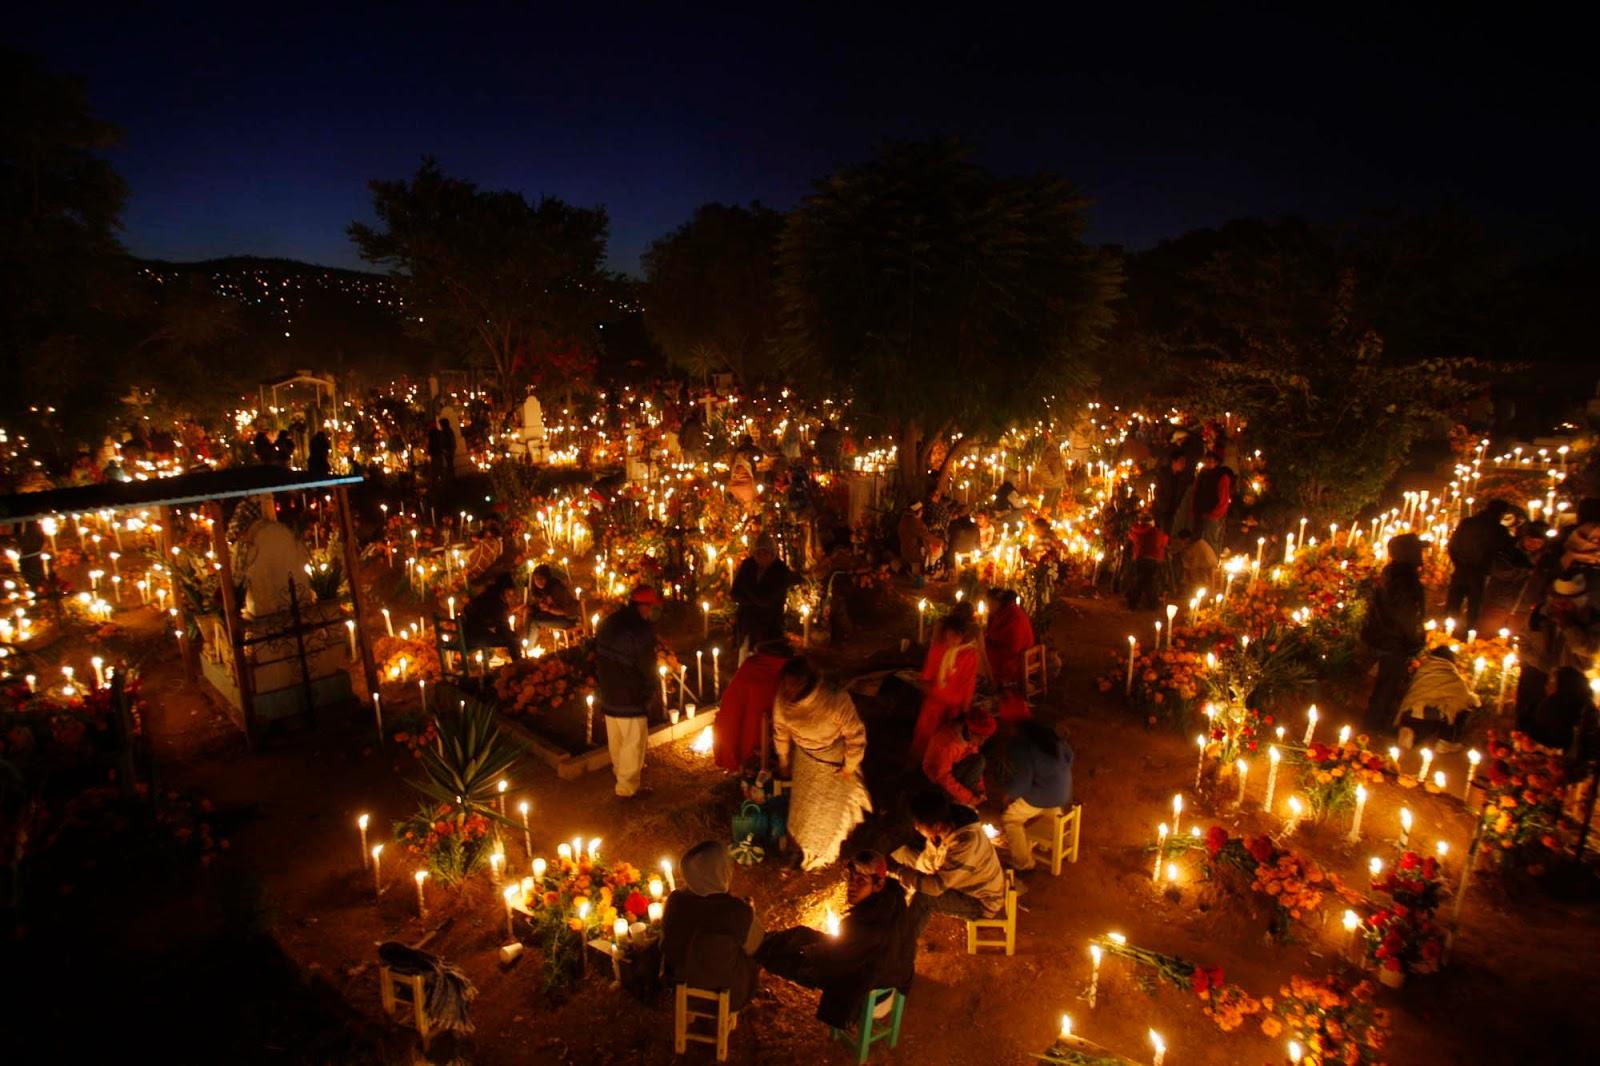 Cemitério em Pátzcuaro - http   agenciatzacapu.com 2017 10 dia-de-muertos -en-michoacan-tradicion-valor-y-compromiso  e2262d2bbf8